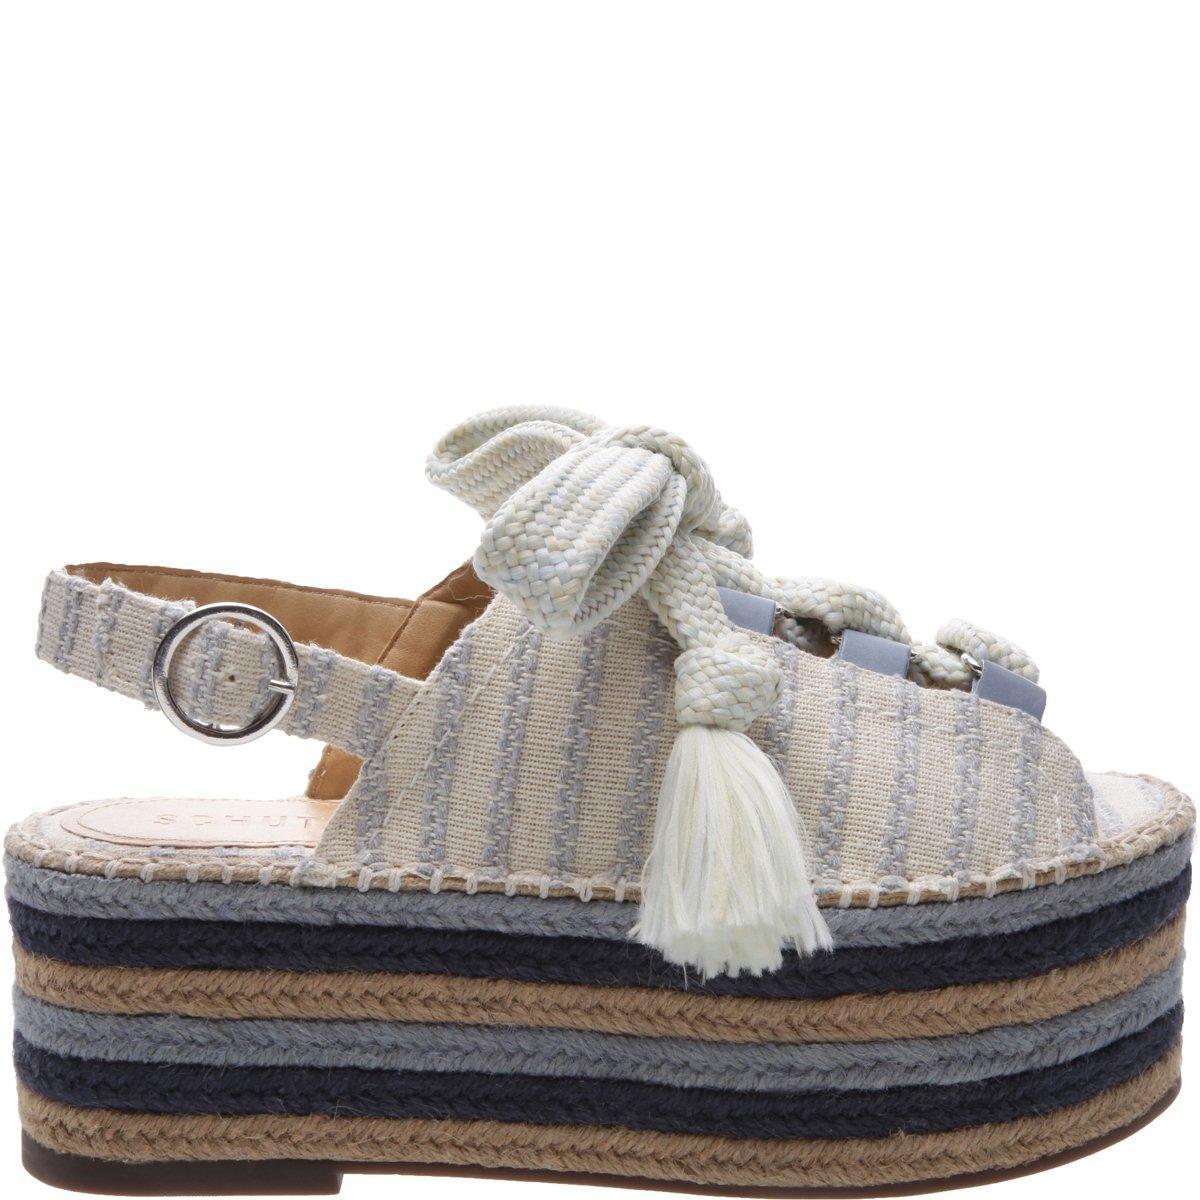 63571613278d Schutz Isabelyta Wedge Sandal In Jeans Multi